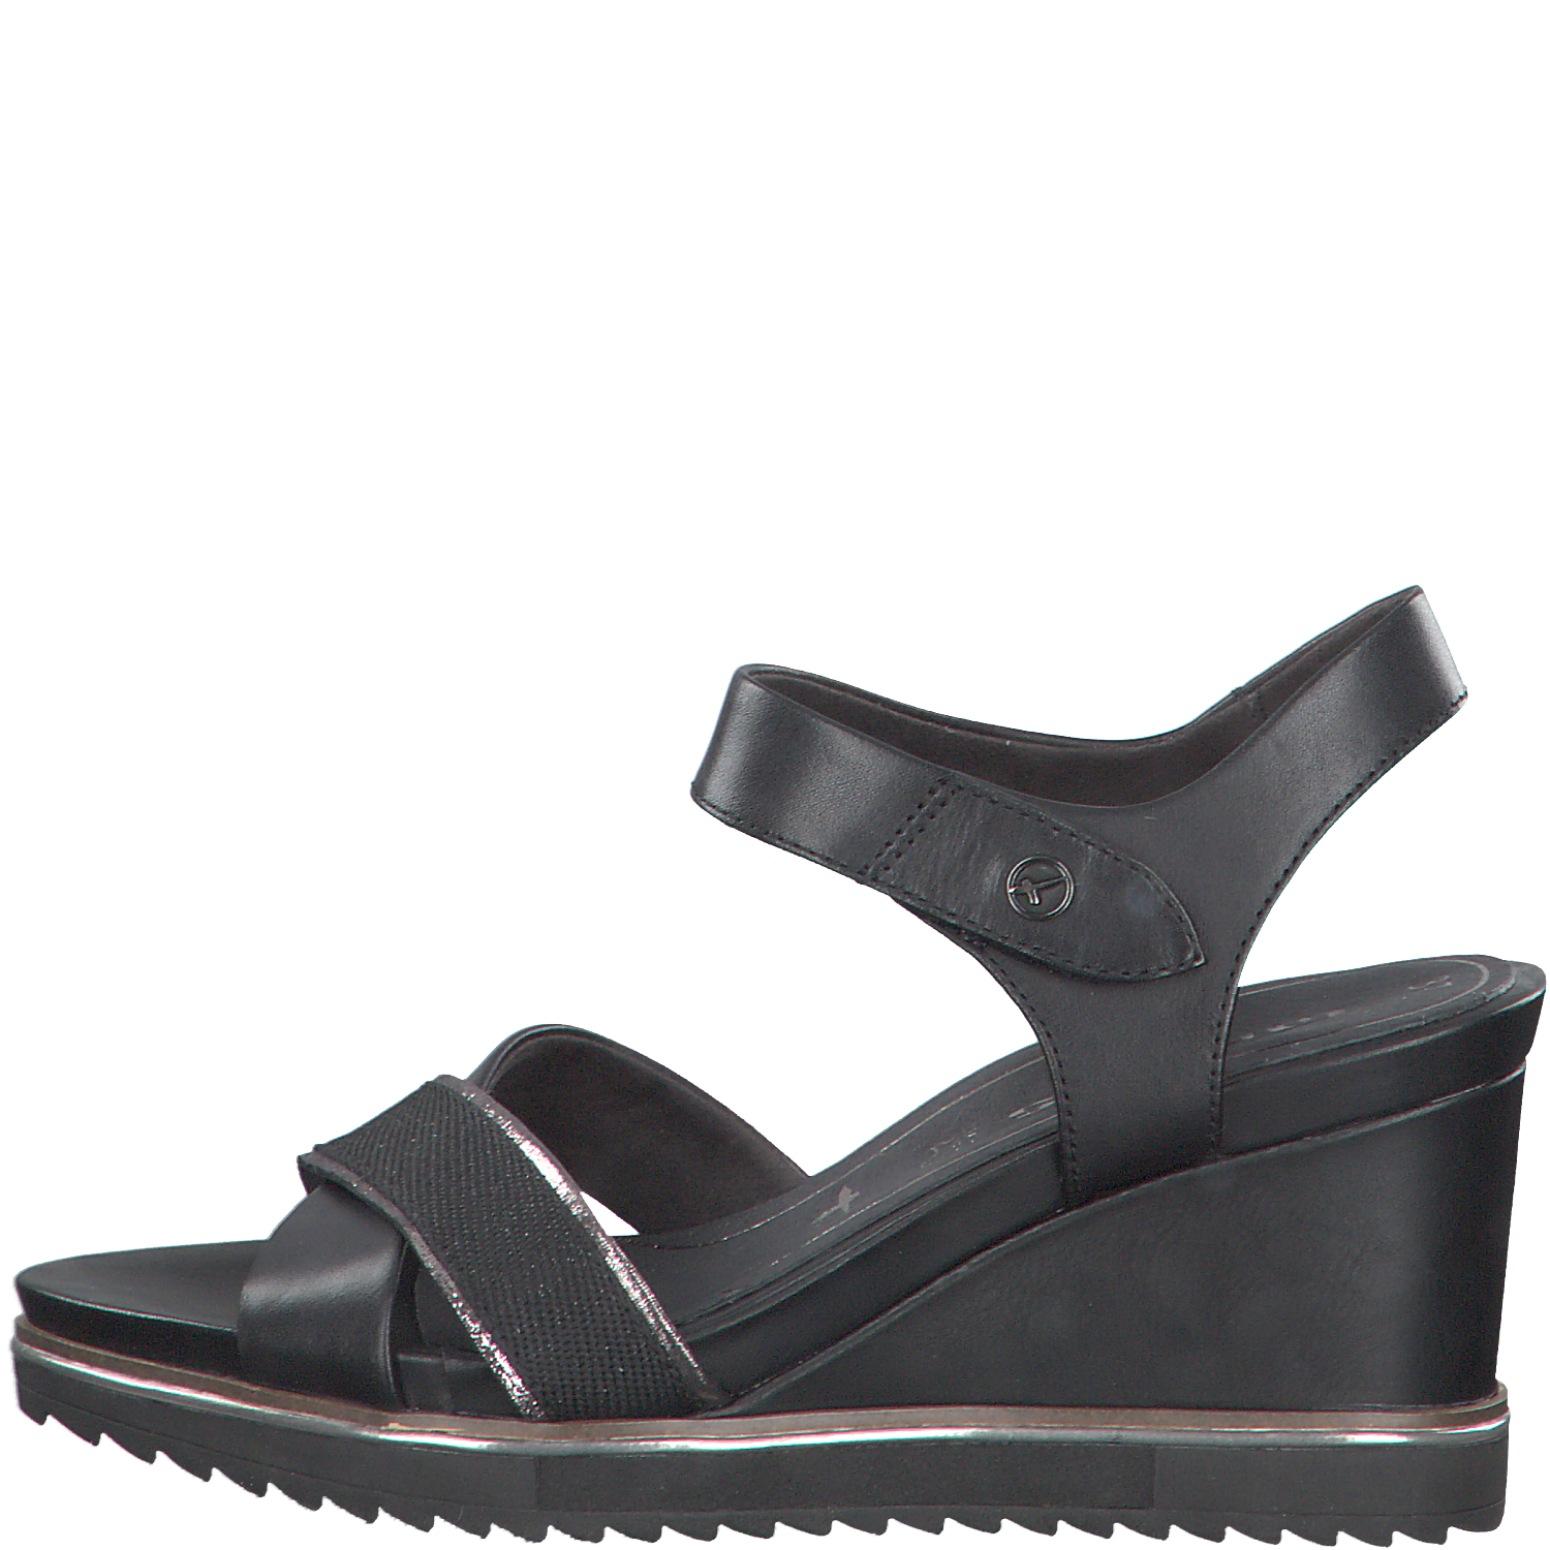 Tamaris 1 1 28350 24 003 Black Leather Sandal.